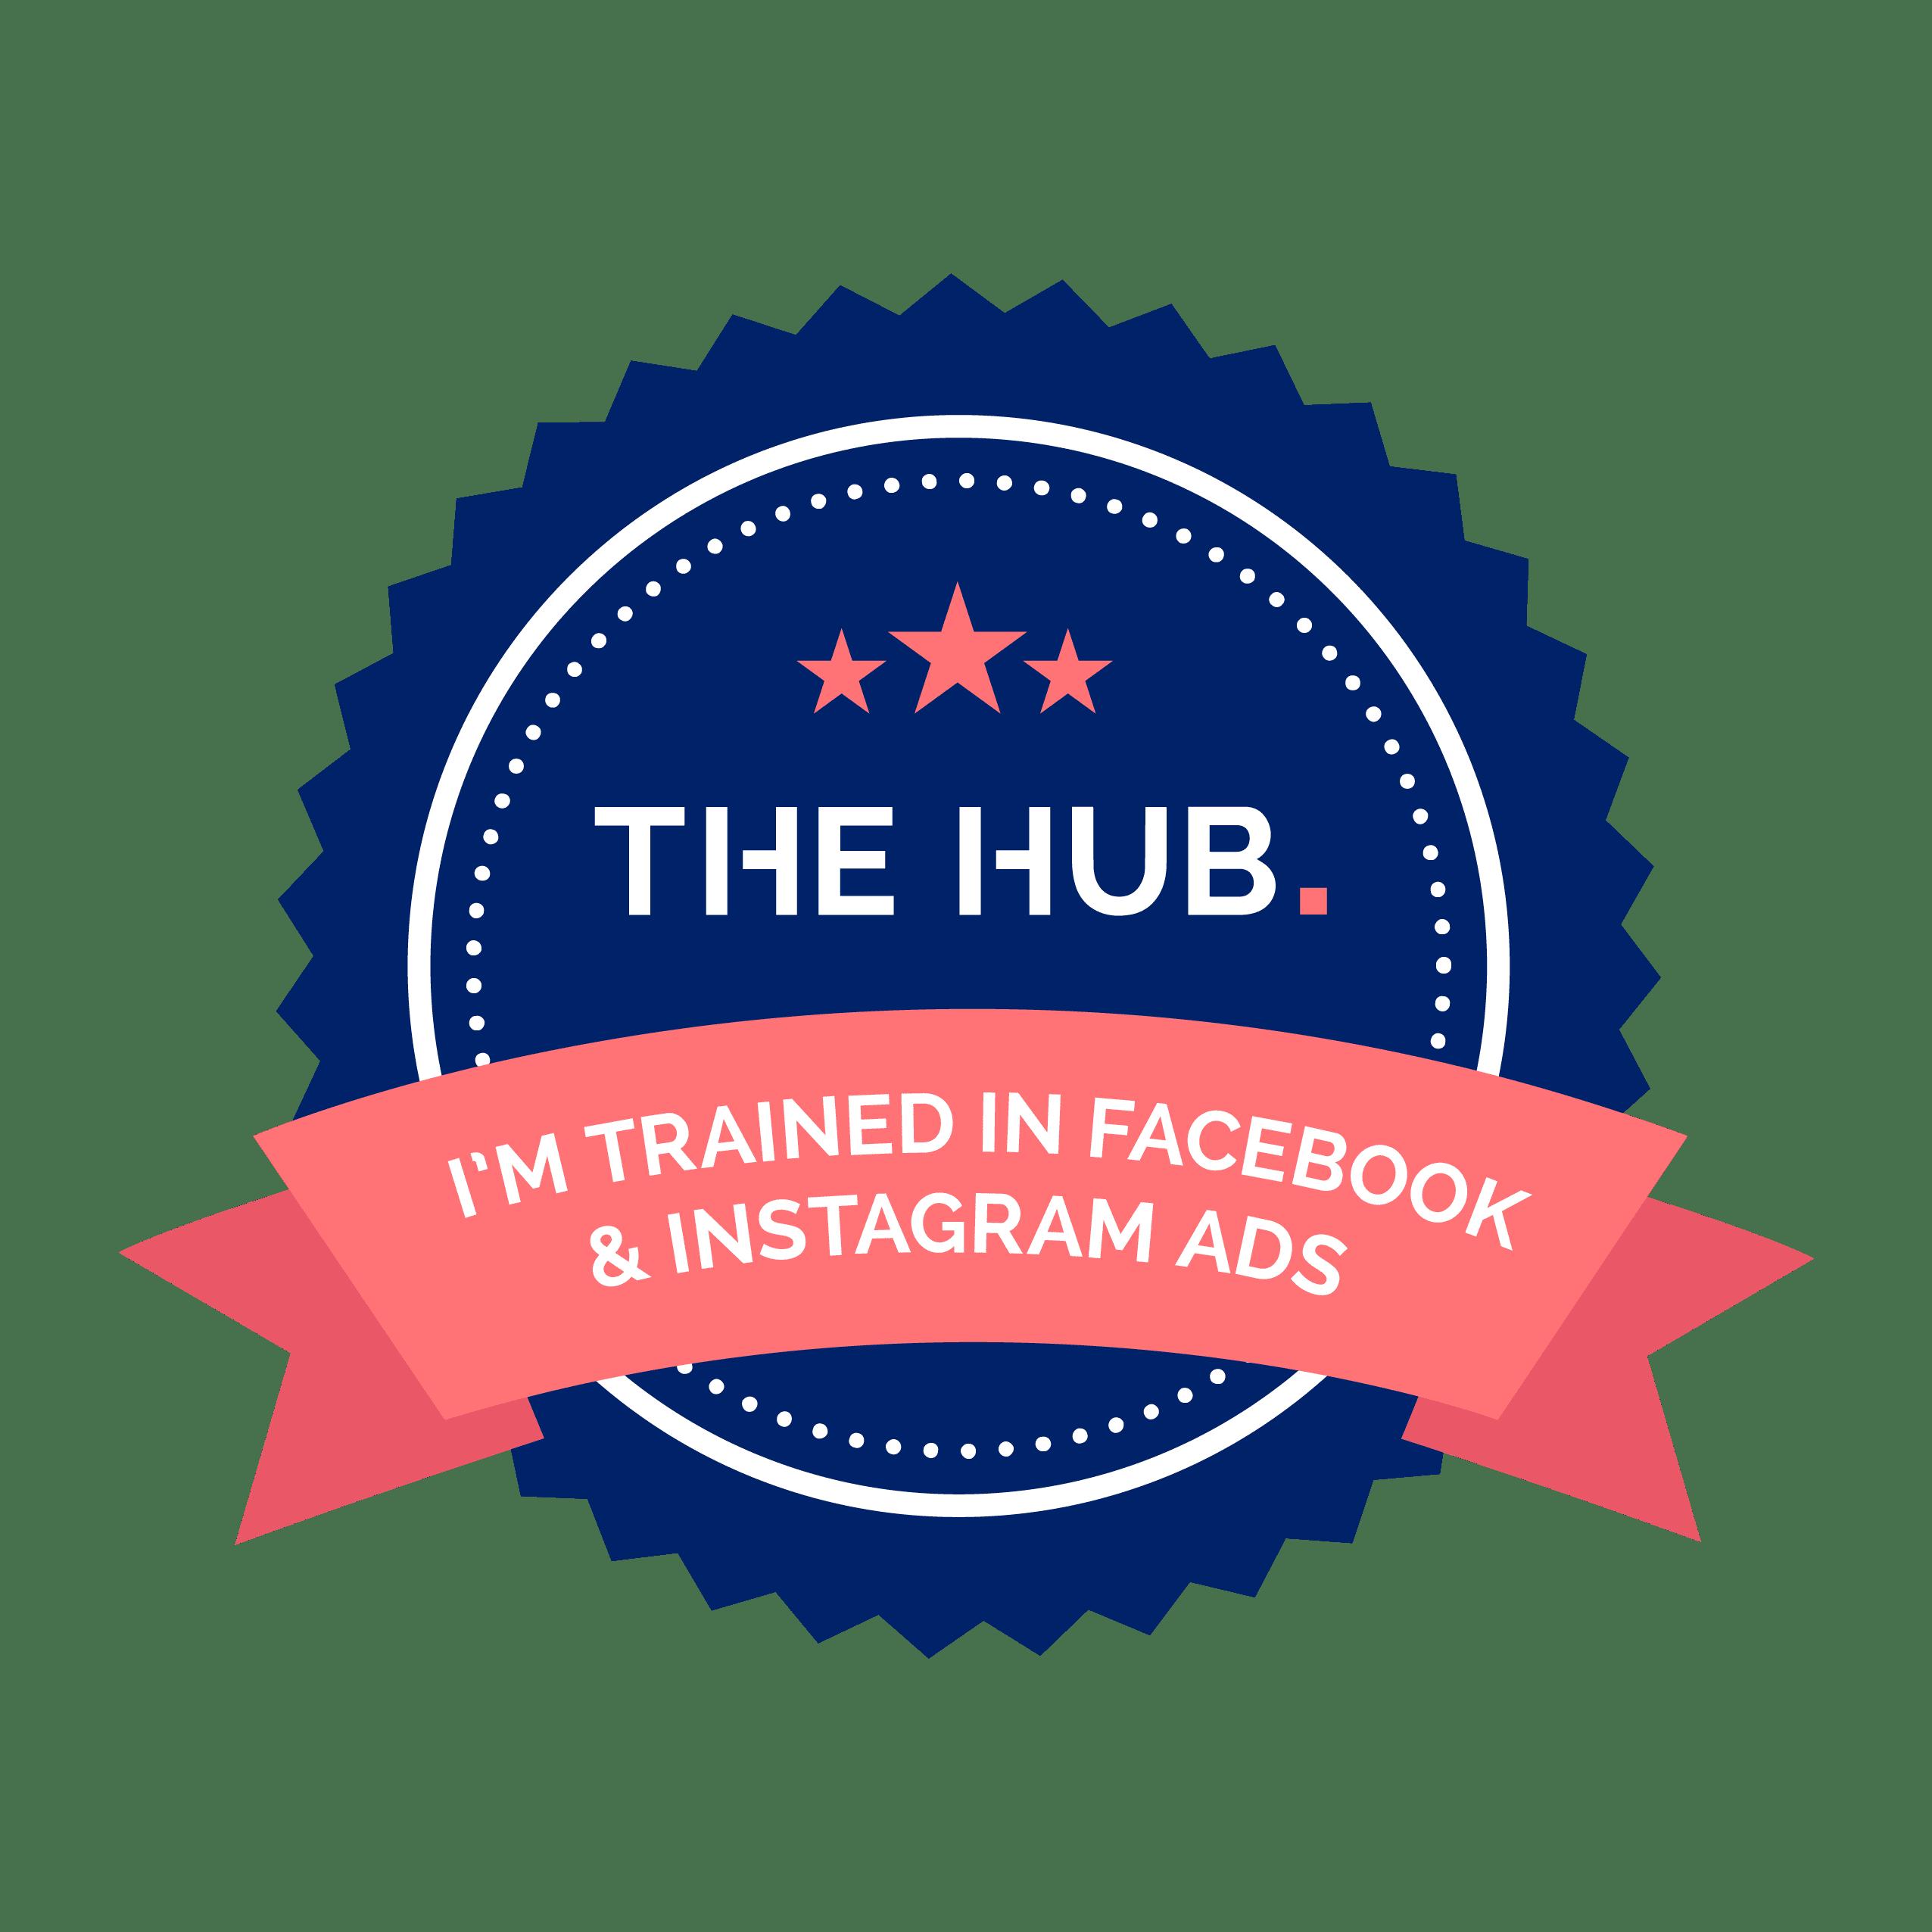 facebook ads certified